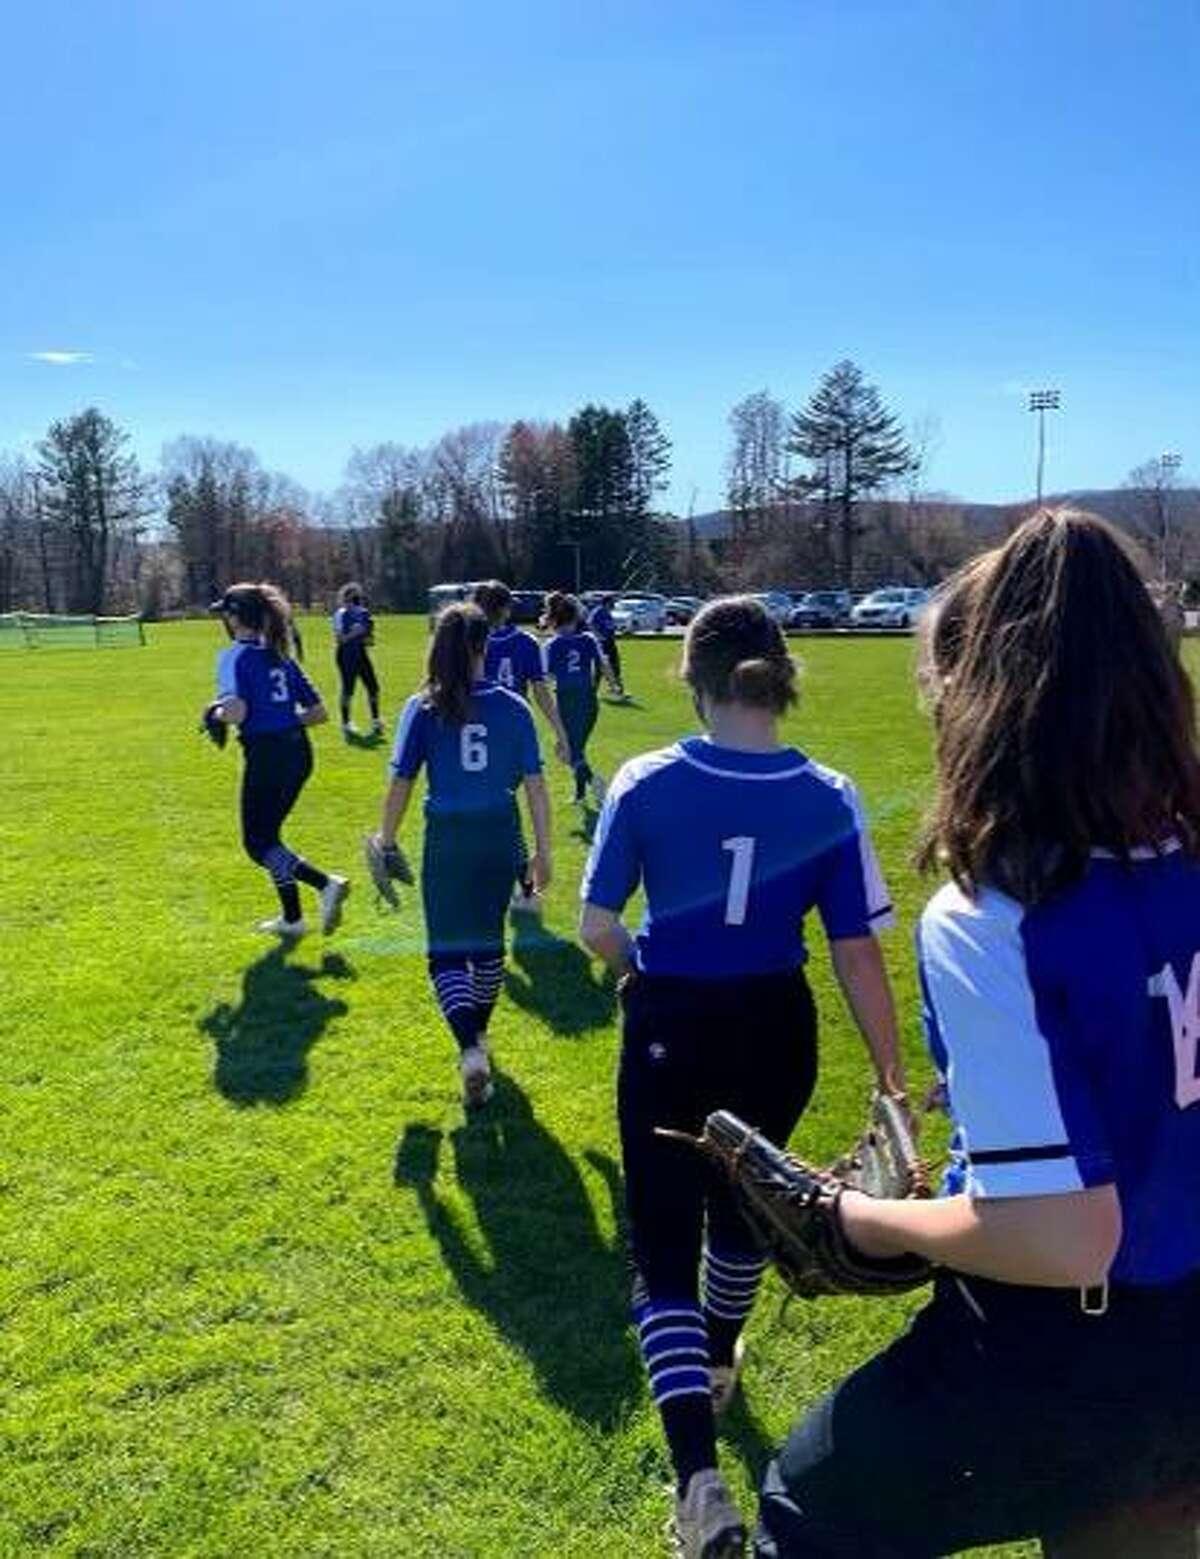 The Fairfield Ludlowe softball team practices ahead of its 2021 season opener.